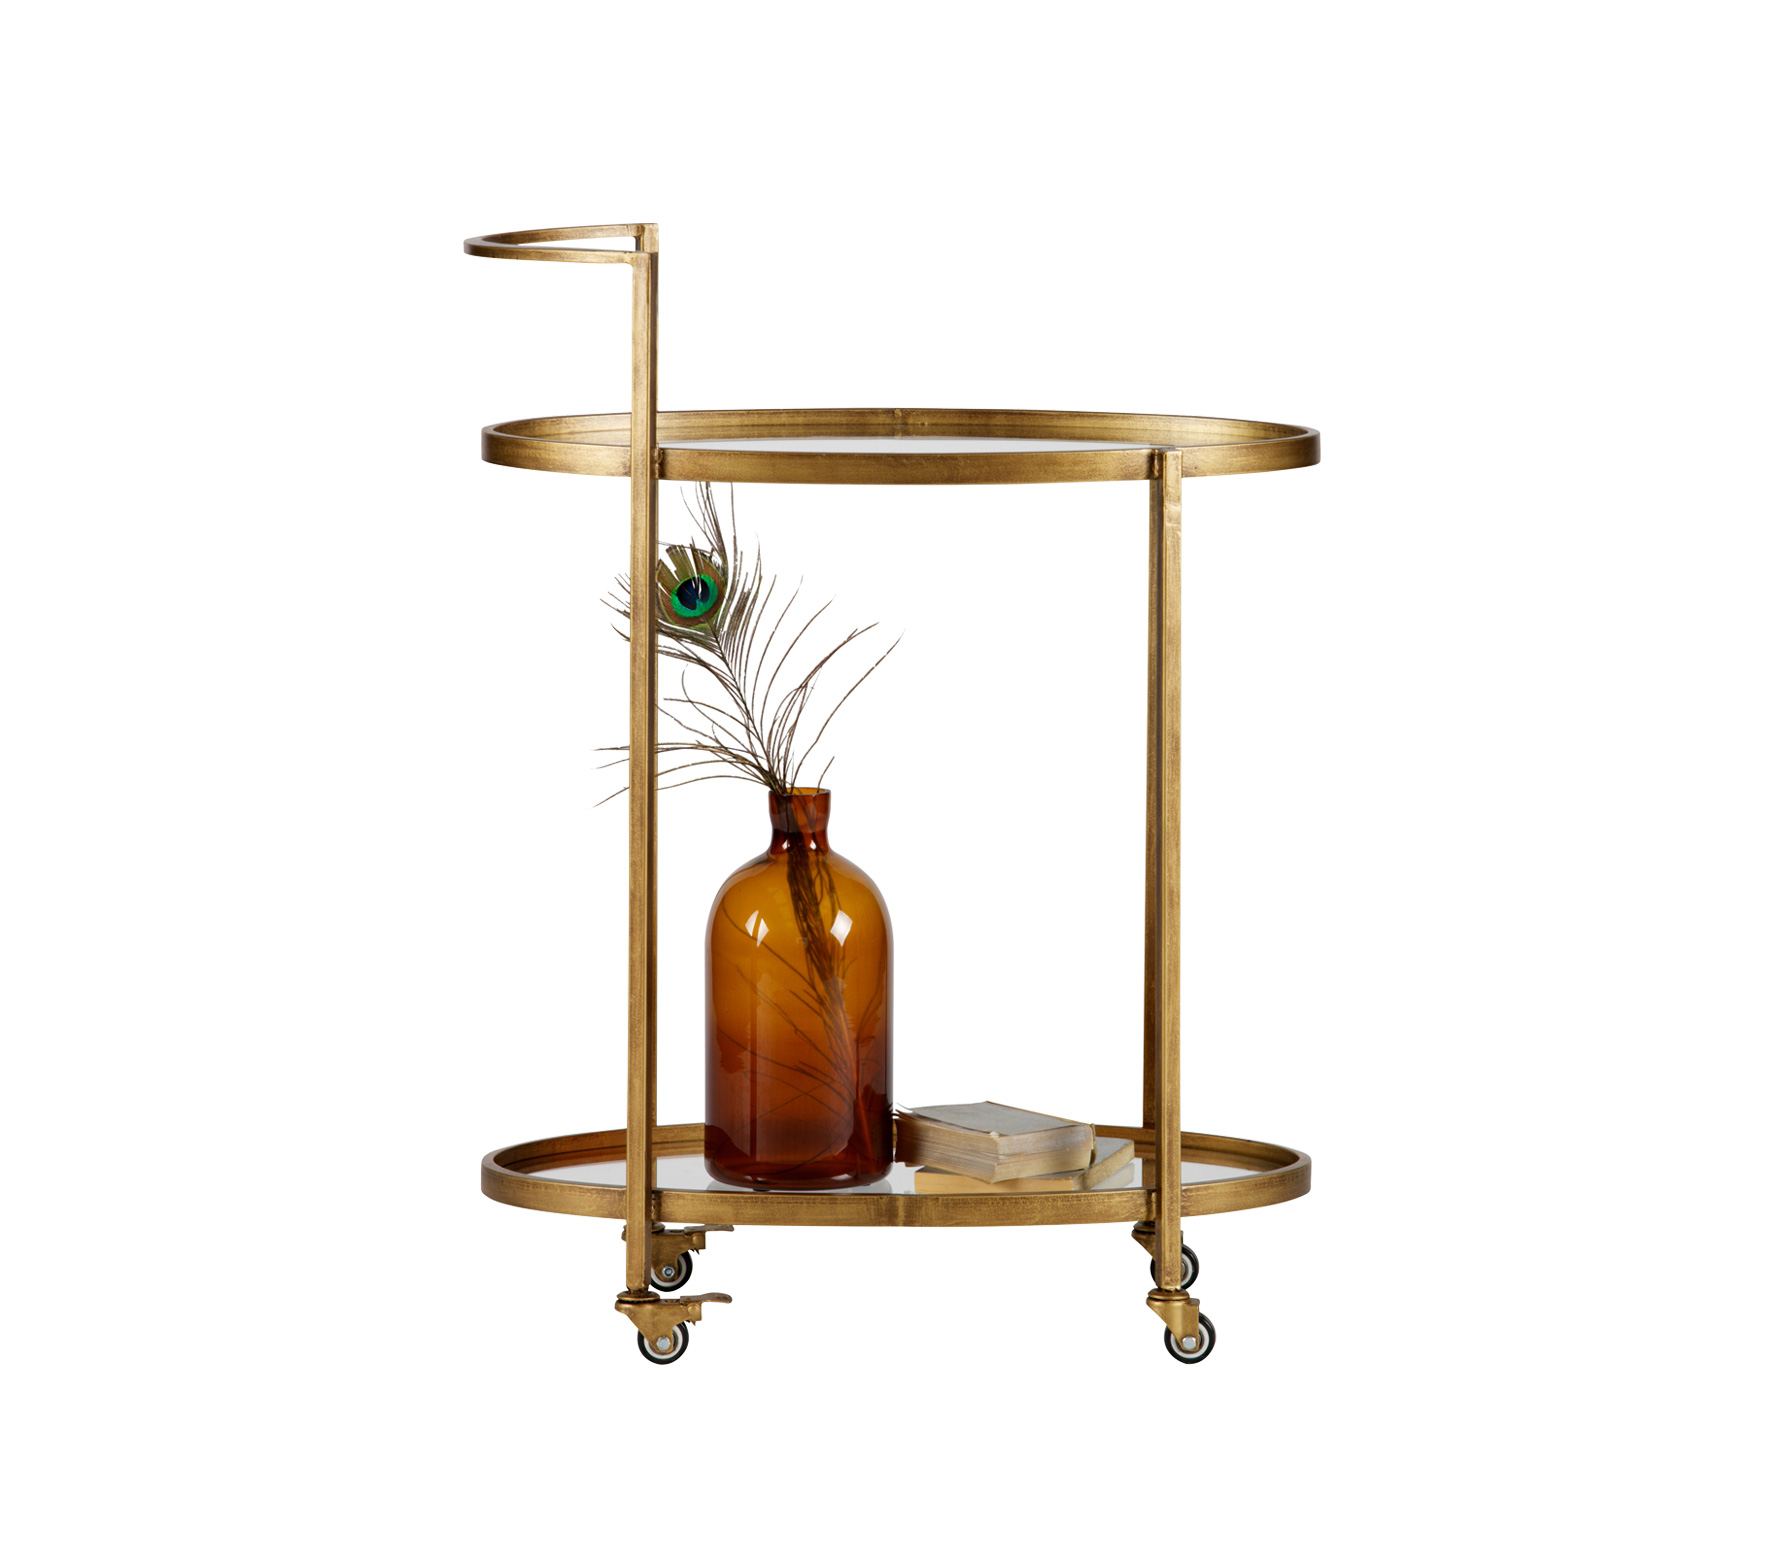 BePureHome Push trolley antique brass Antique brass